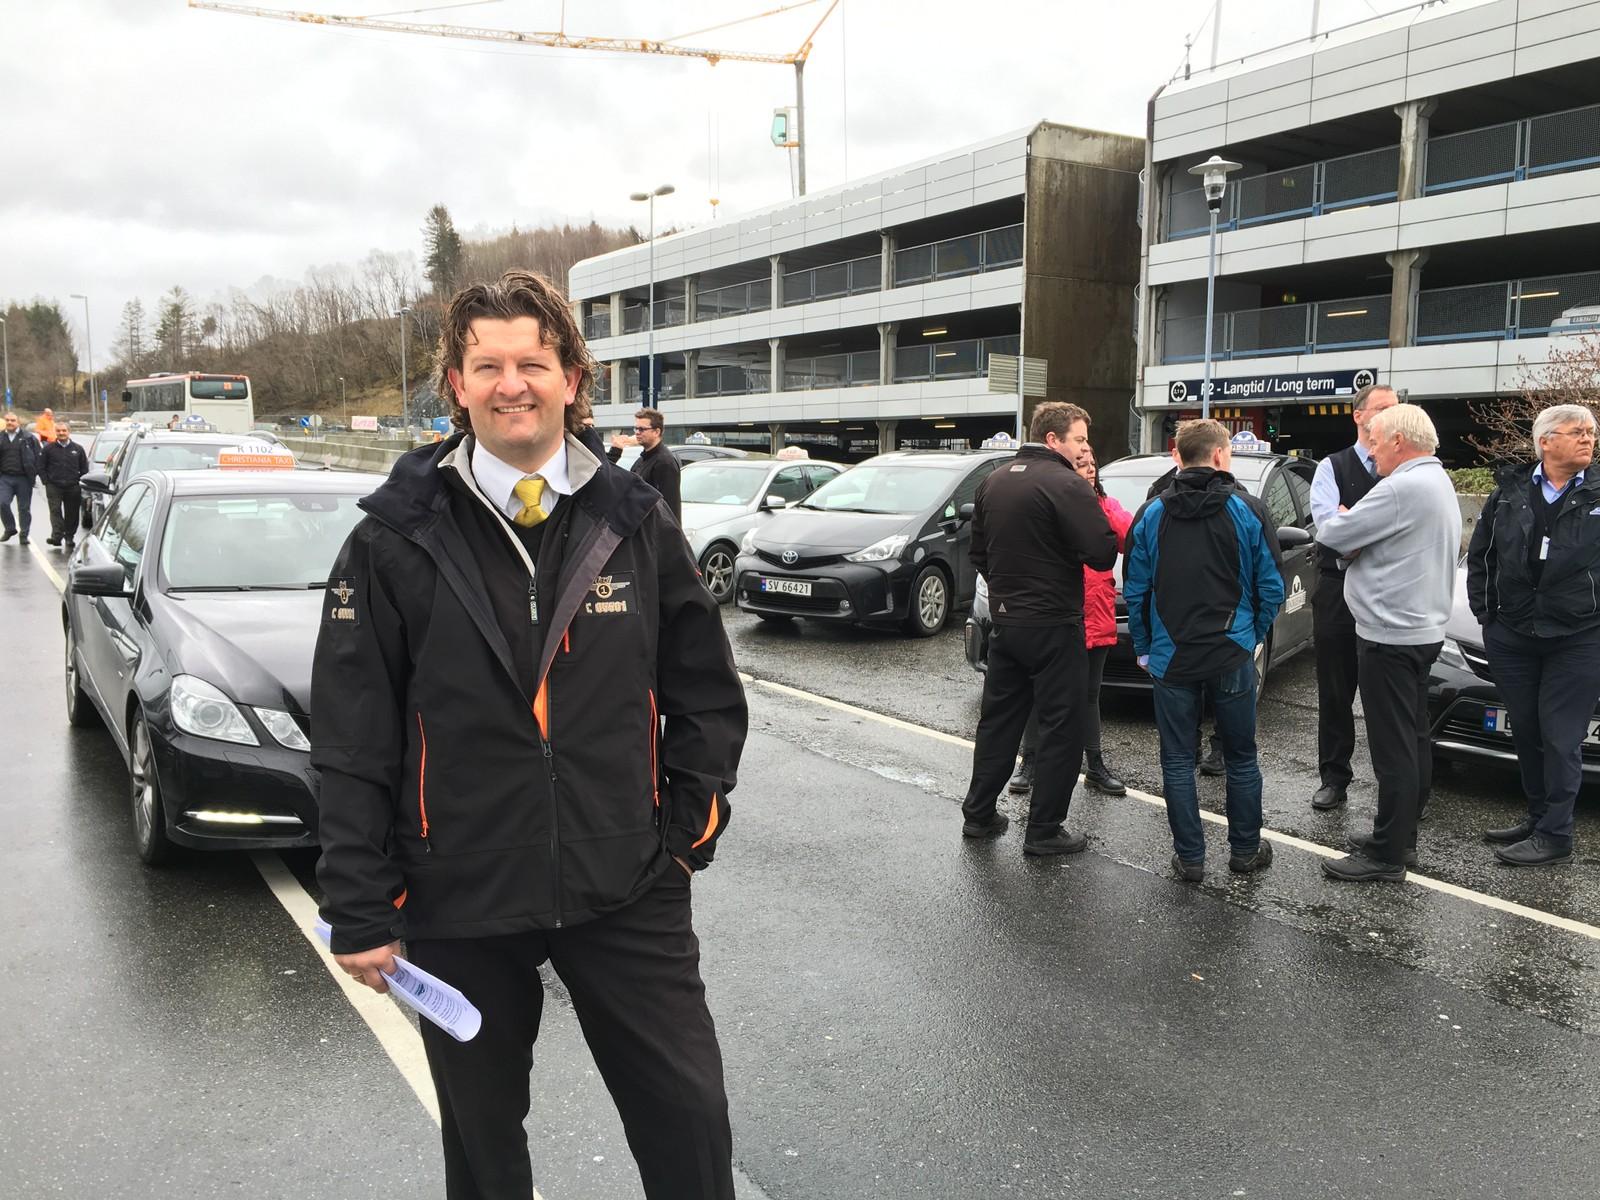 KLAR TIL KAMP: Robert Aasmul i Taxi 1 tror det vil være få drosjer på Flesland i ettermiddag. - Drosjenæringen står samlet, sier han.